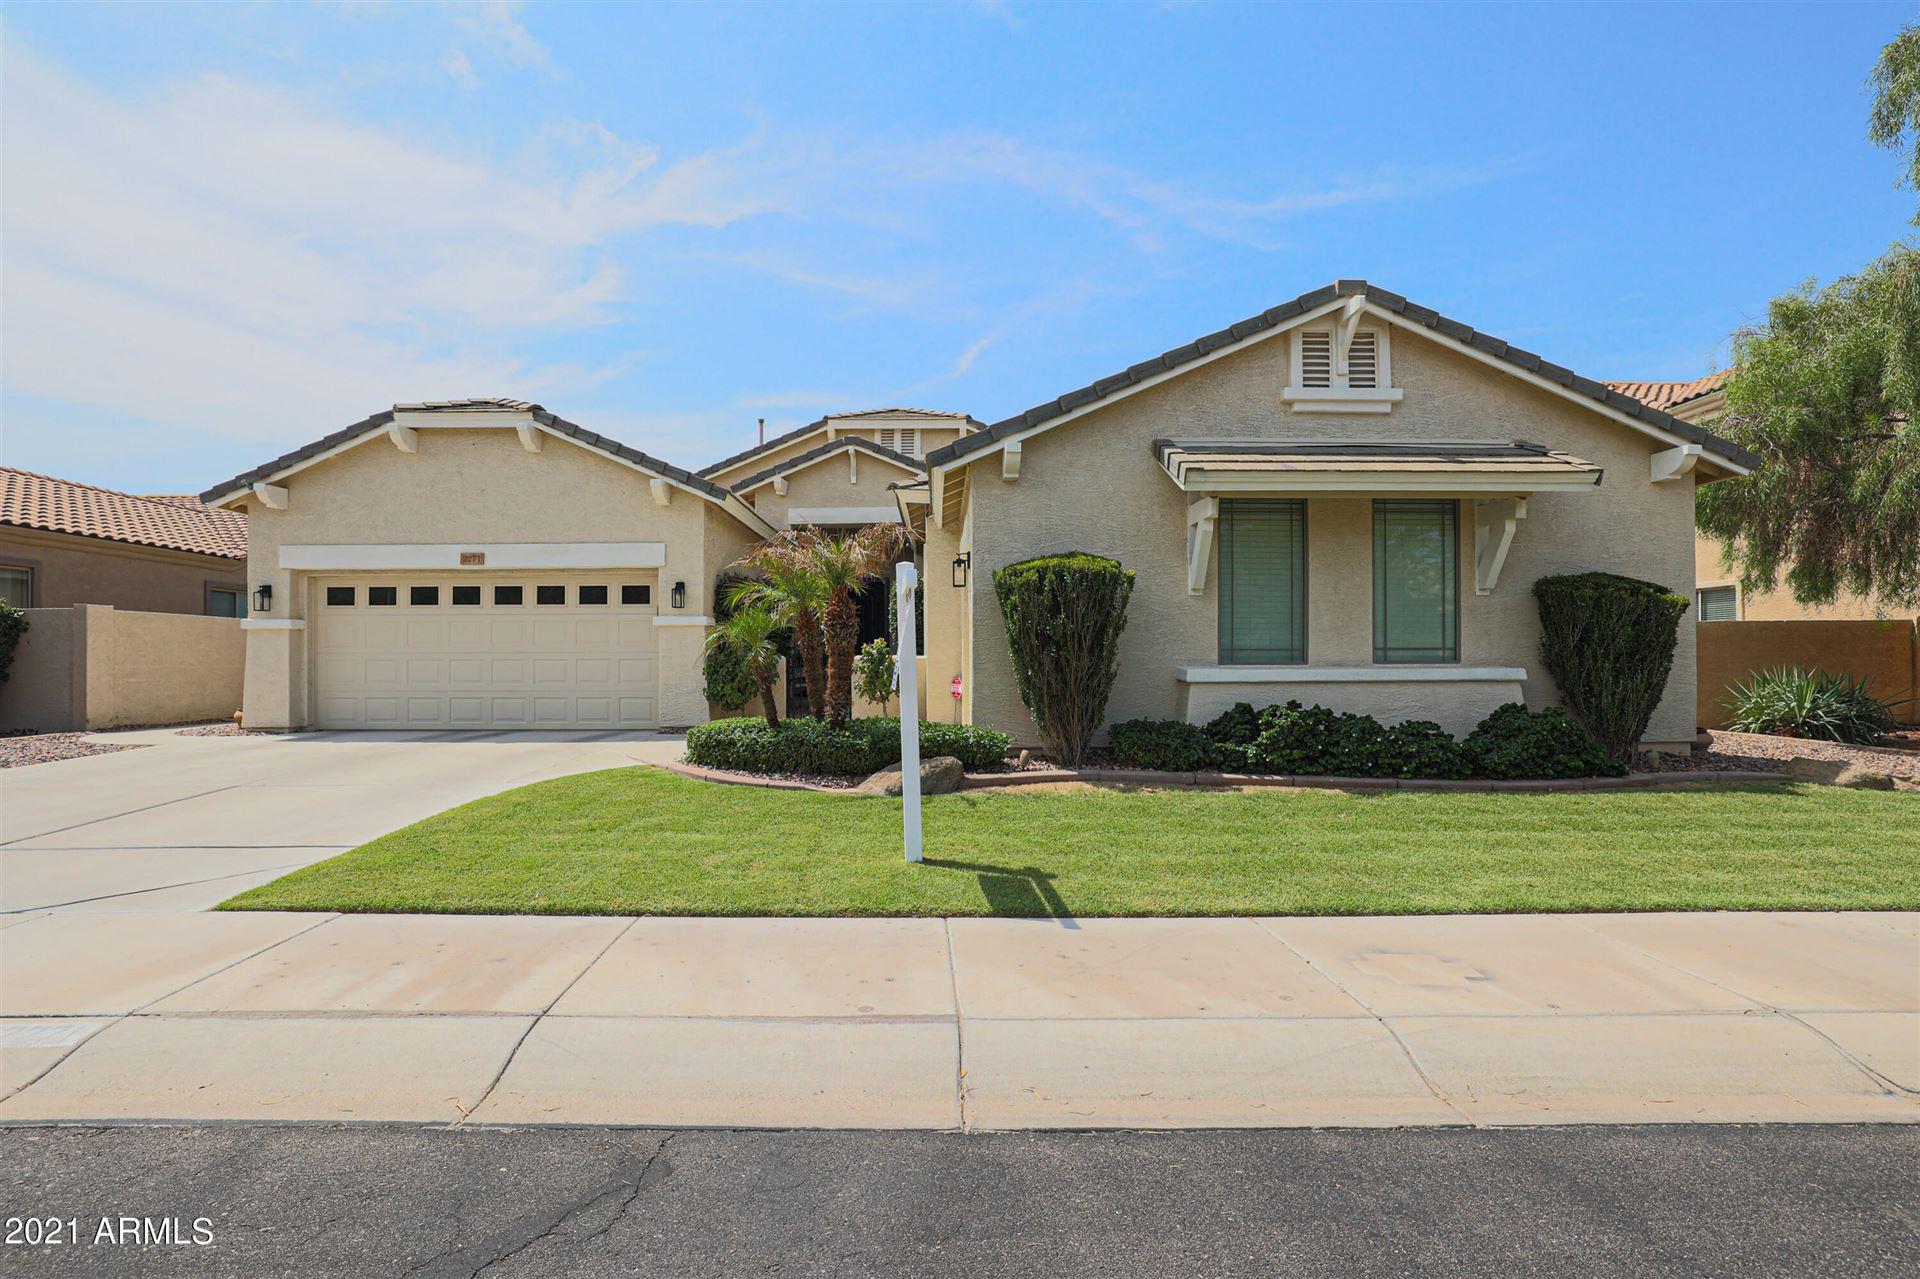 Photo of 2271 E INDIGO Drive, Chandler, AZ 85286 (MLS # 6269153)